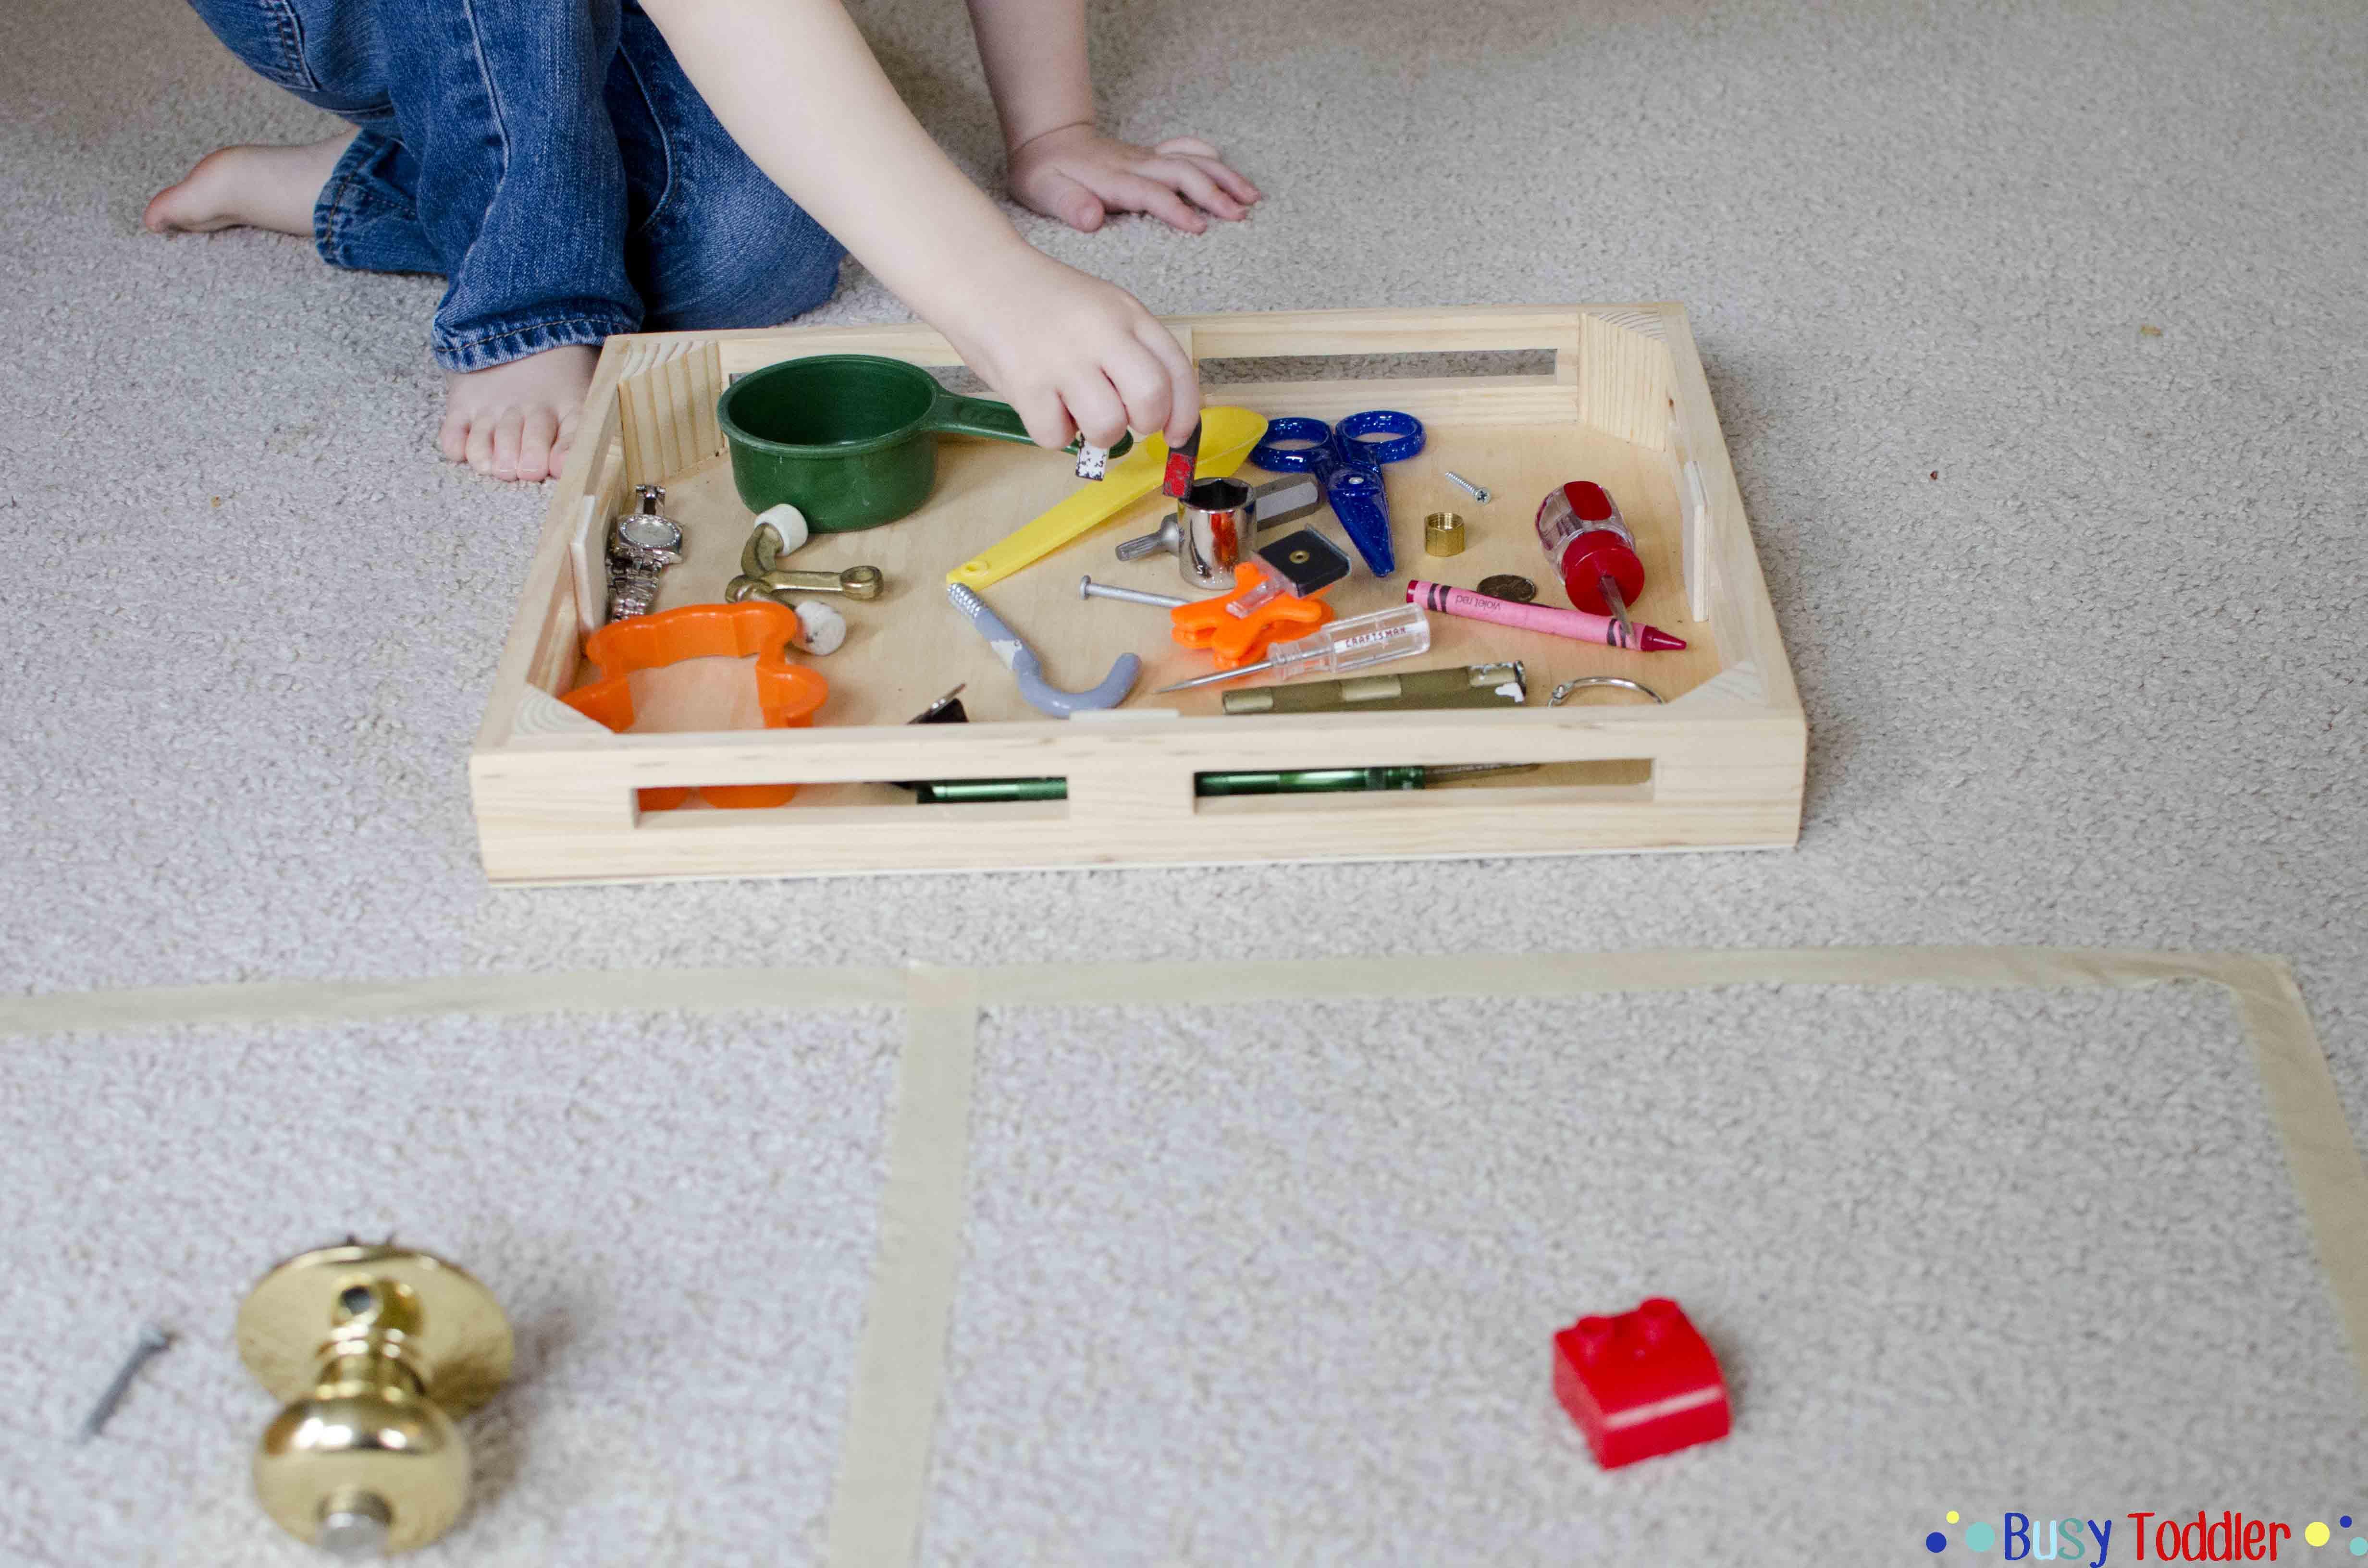 MAGNET SORT: A fun toddler STEM activity